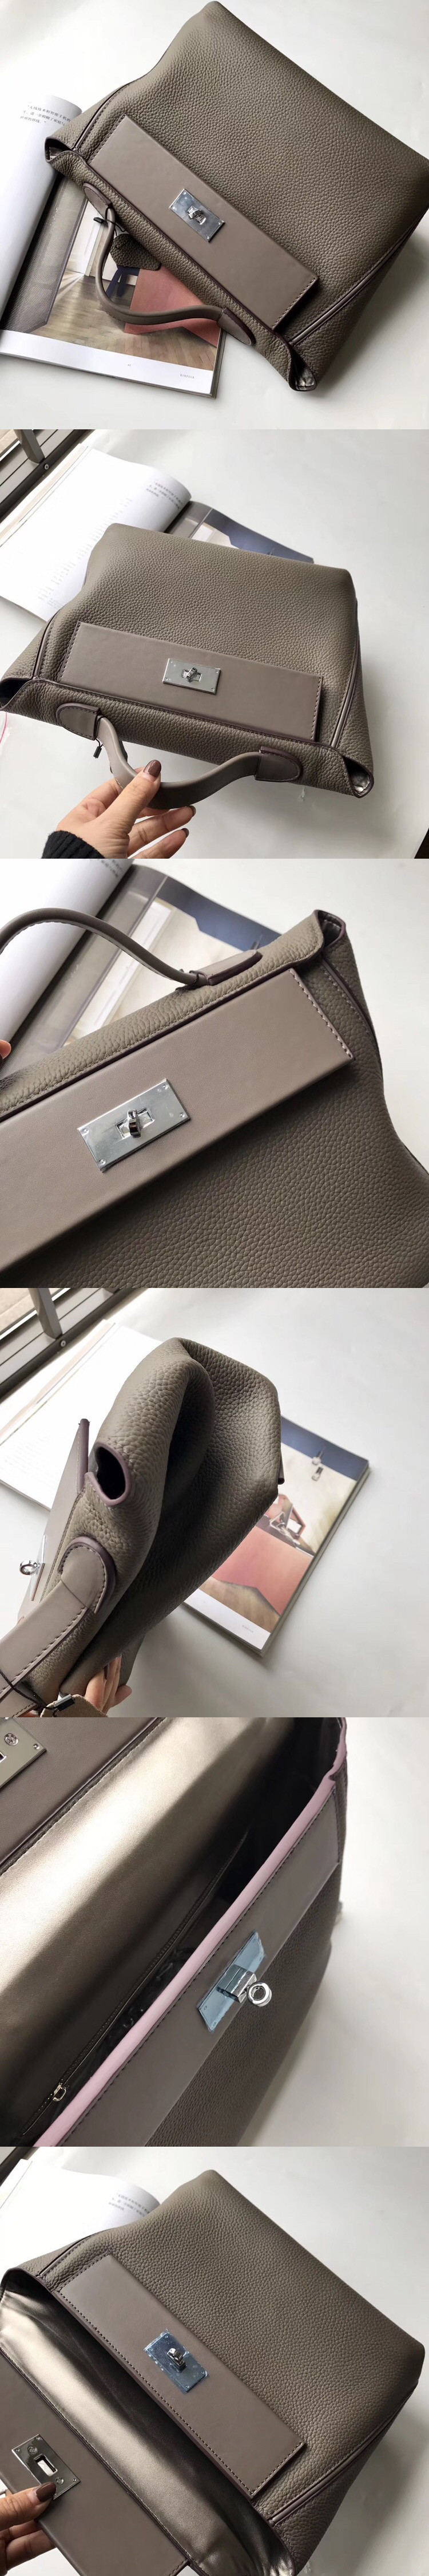 Luxury Designer Handbags 2019 Women Genuine Leather Famous Brand Handbags High Quality Tote Shoulder Bag purse (3)